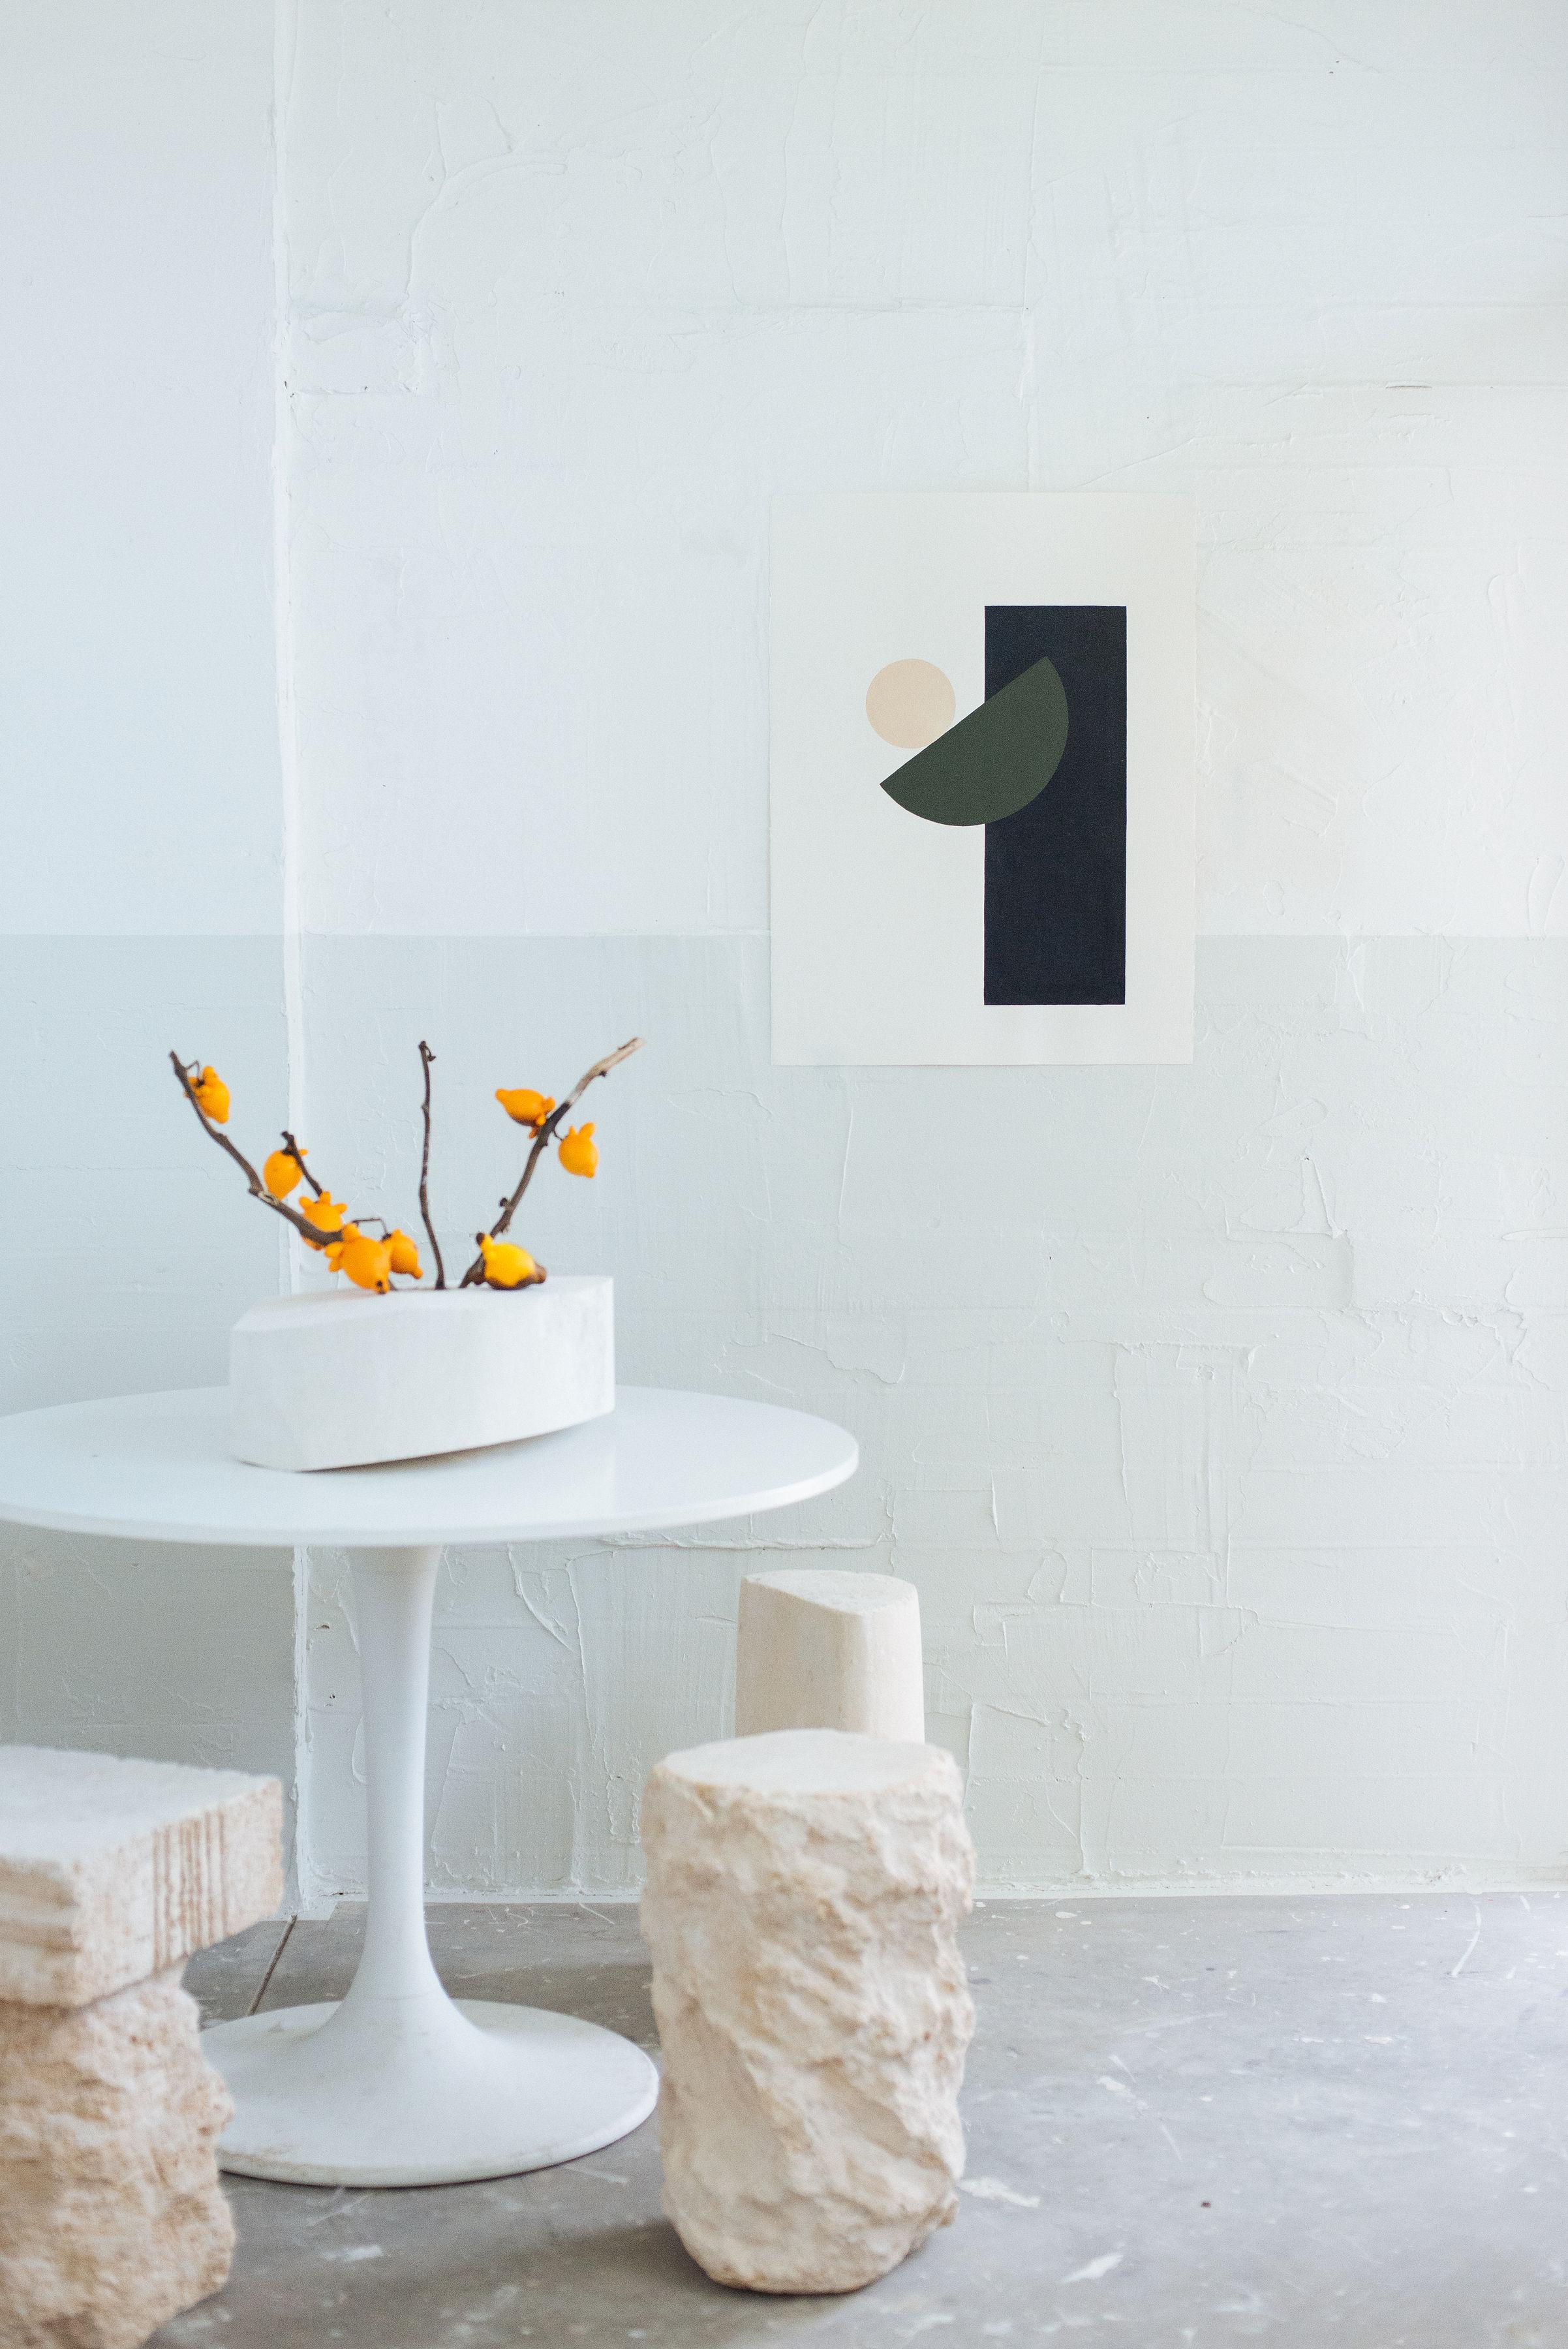 'Modern Balance' by Bobby CLark